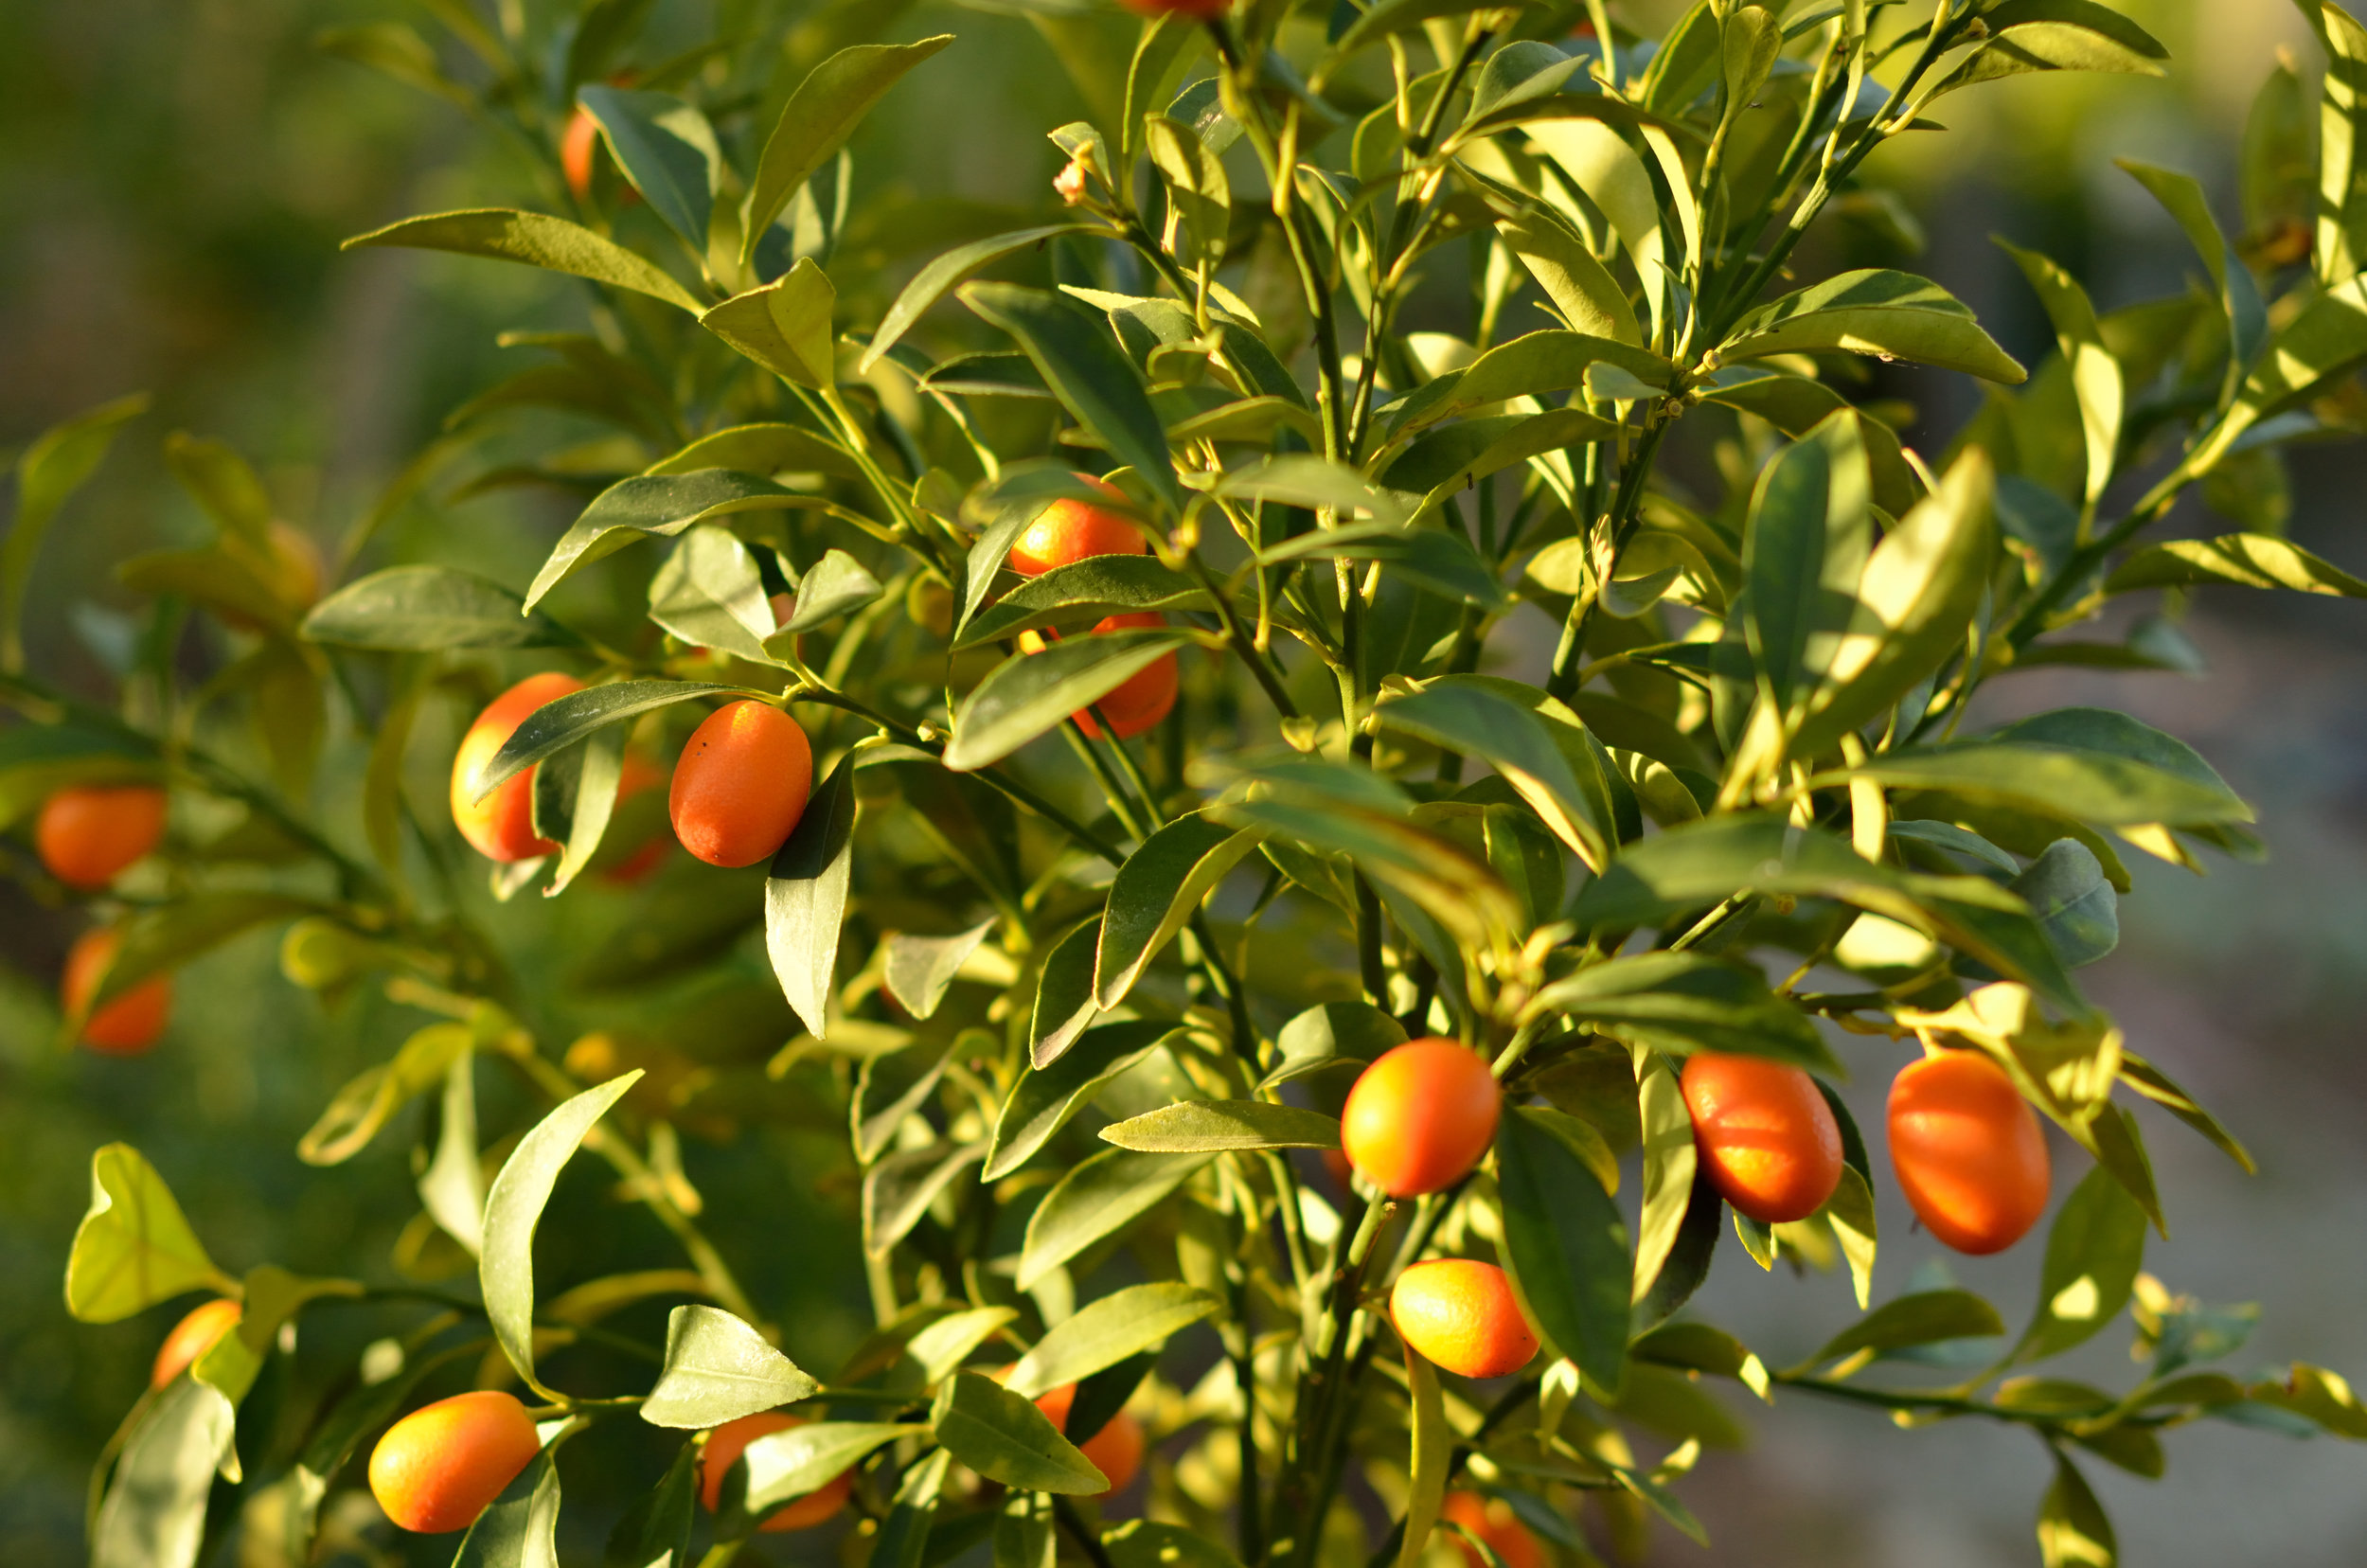 Kumquats growing in the Pasadena sunshine.